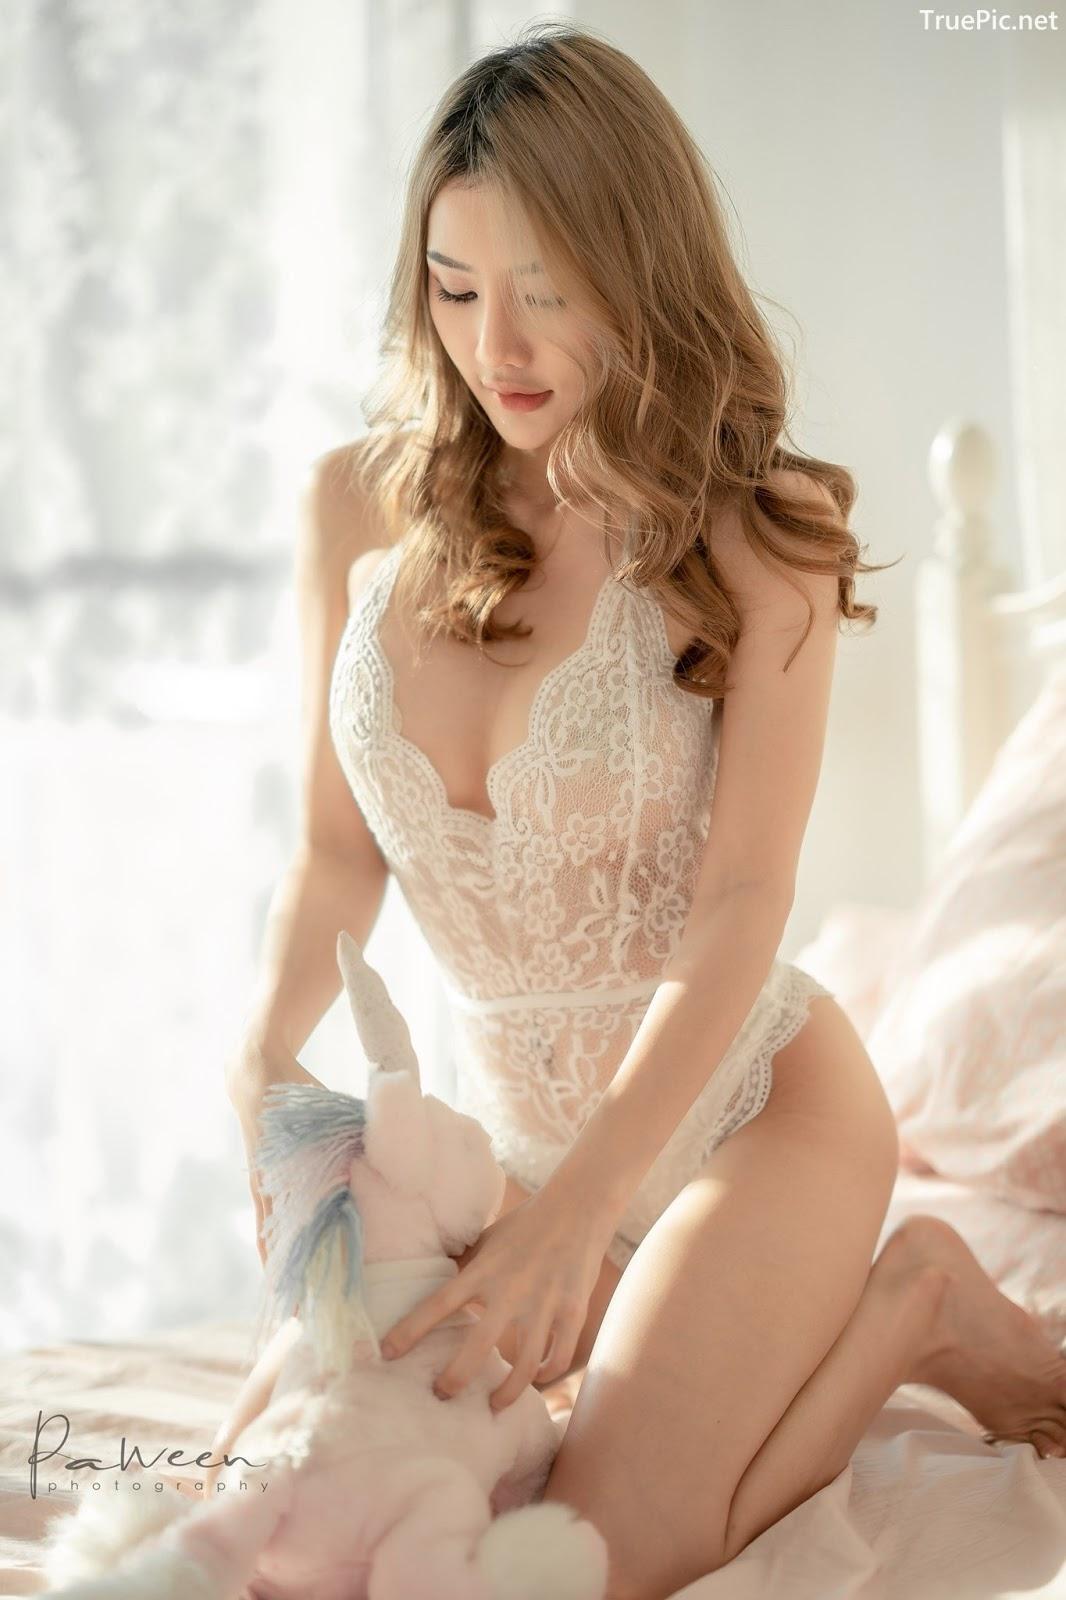 Image Thailand Model - Atittaya Chaiyasing - White Lace Lingerie - TruePic.net - Picture-10